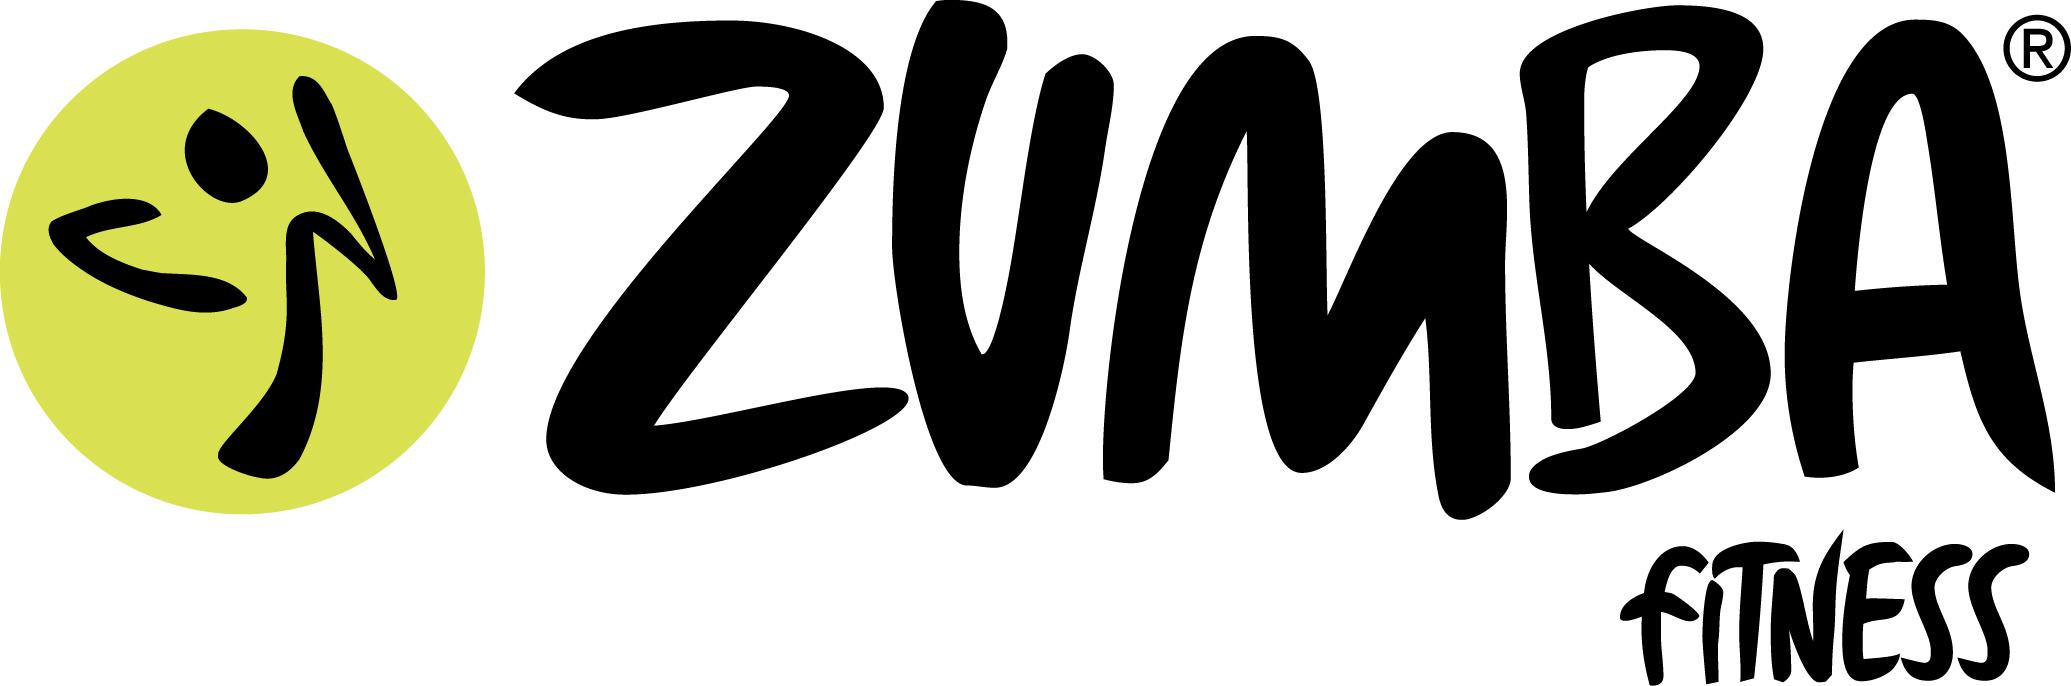 Zumba classes offered day, night